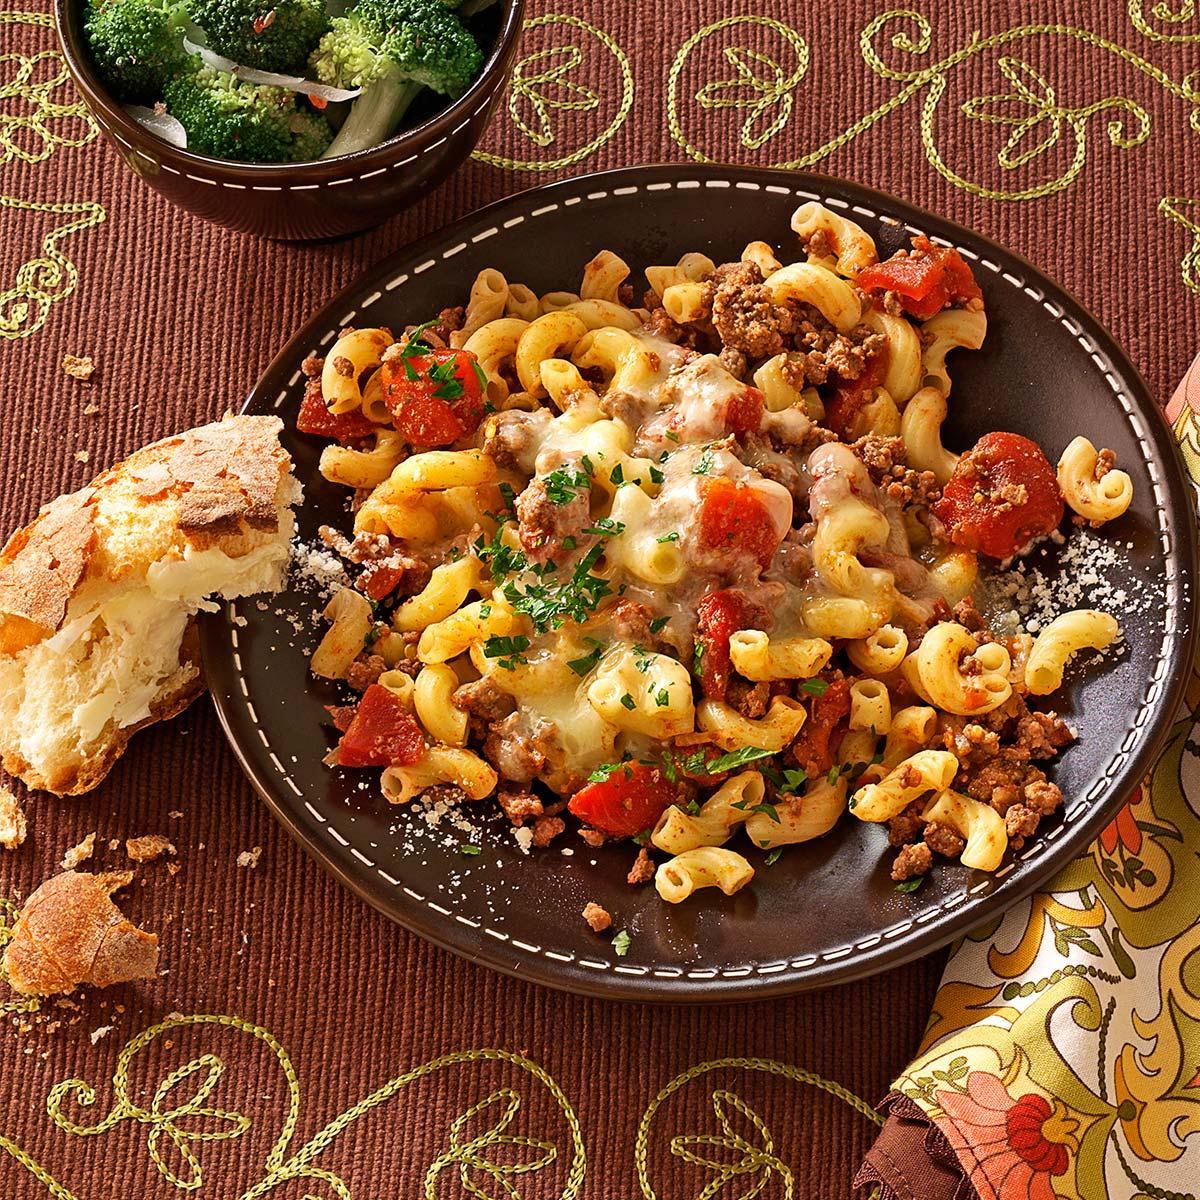 Stovetop Italian Macaroni_image